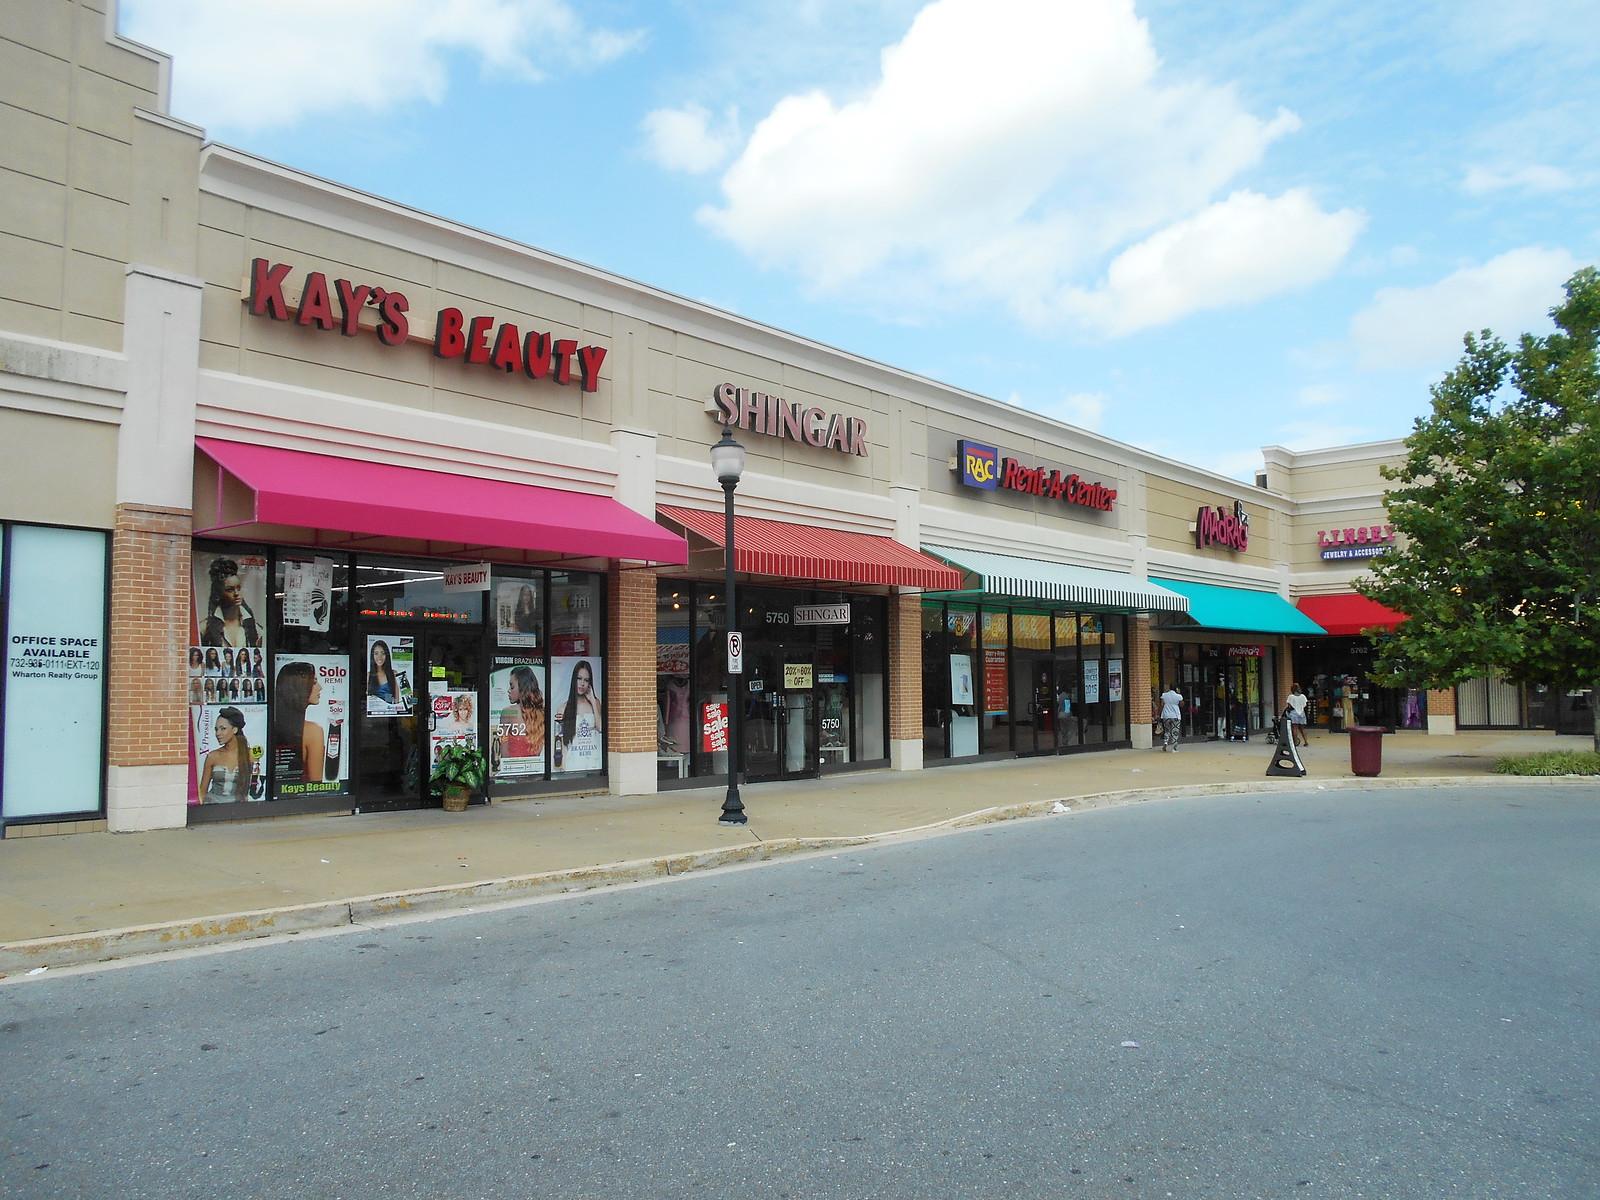 Shoping Center Awnings